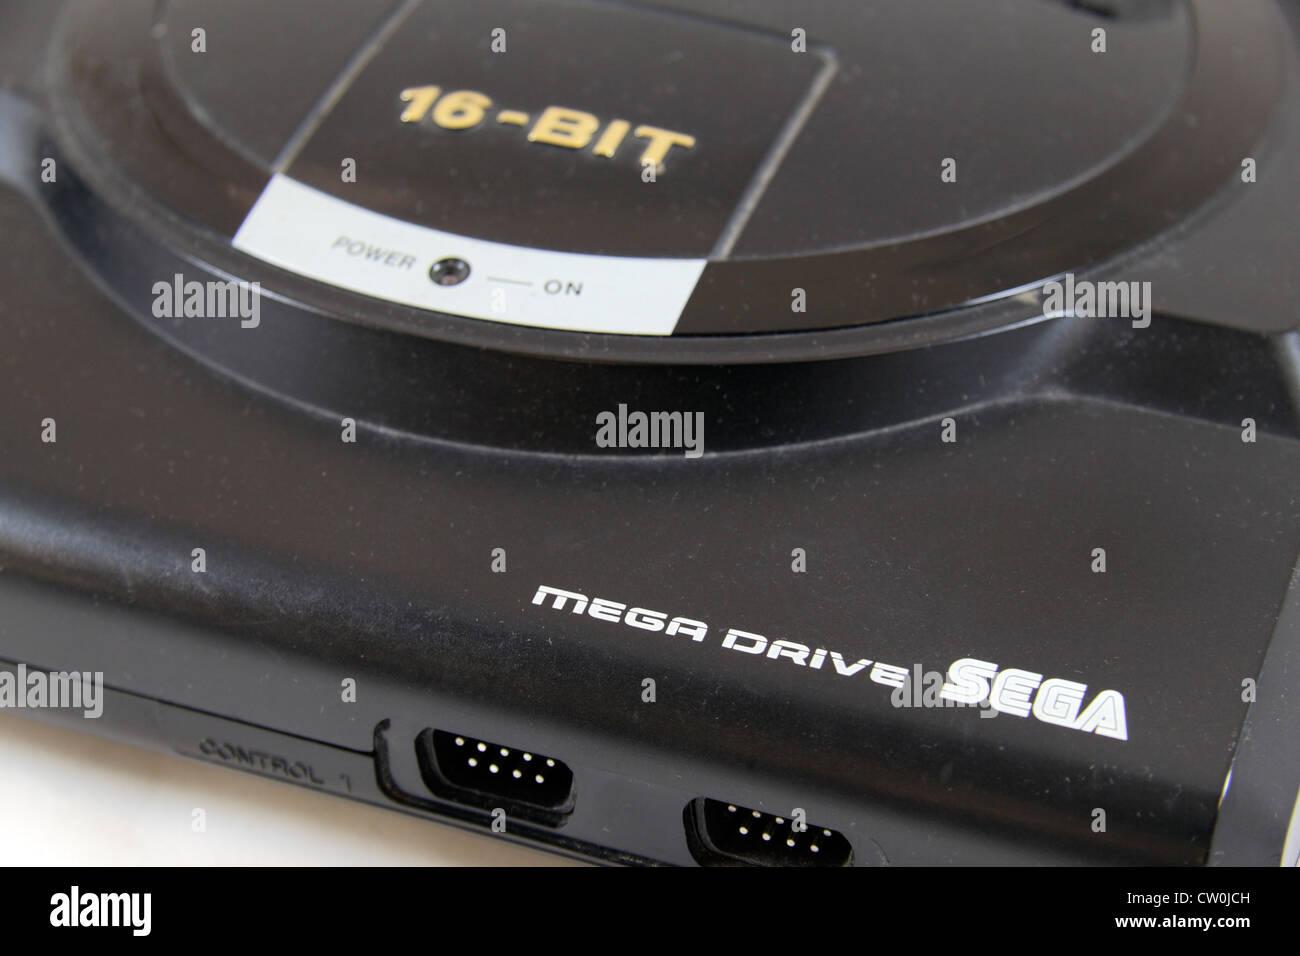 The SEGA Megadrive, a fourth-generation video game console by SEGA, (1990).  Called the SEGA Genesis in North America. Stock Photo